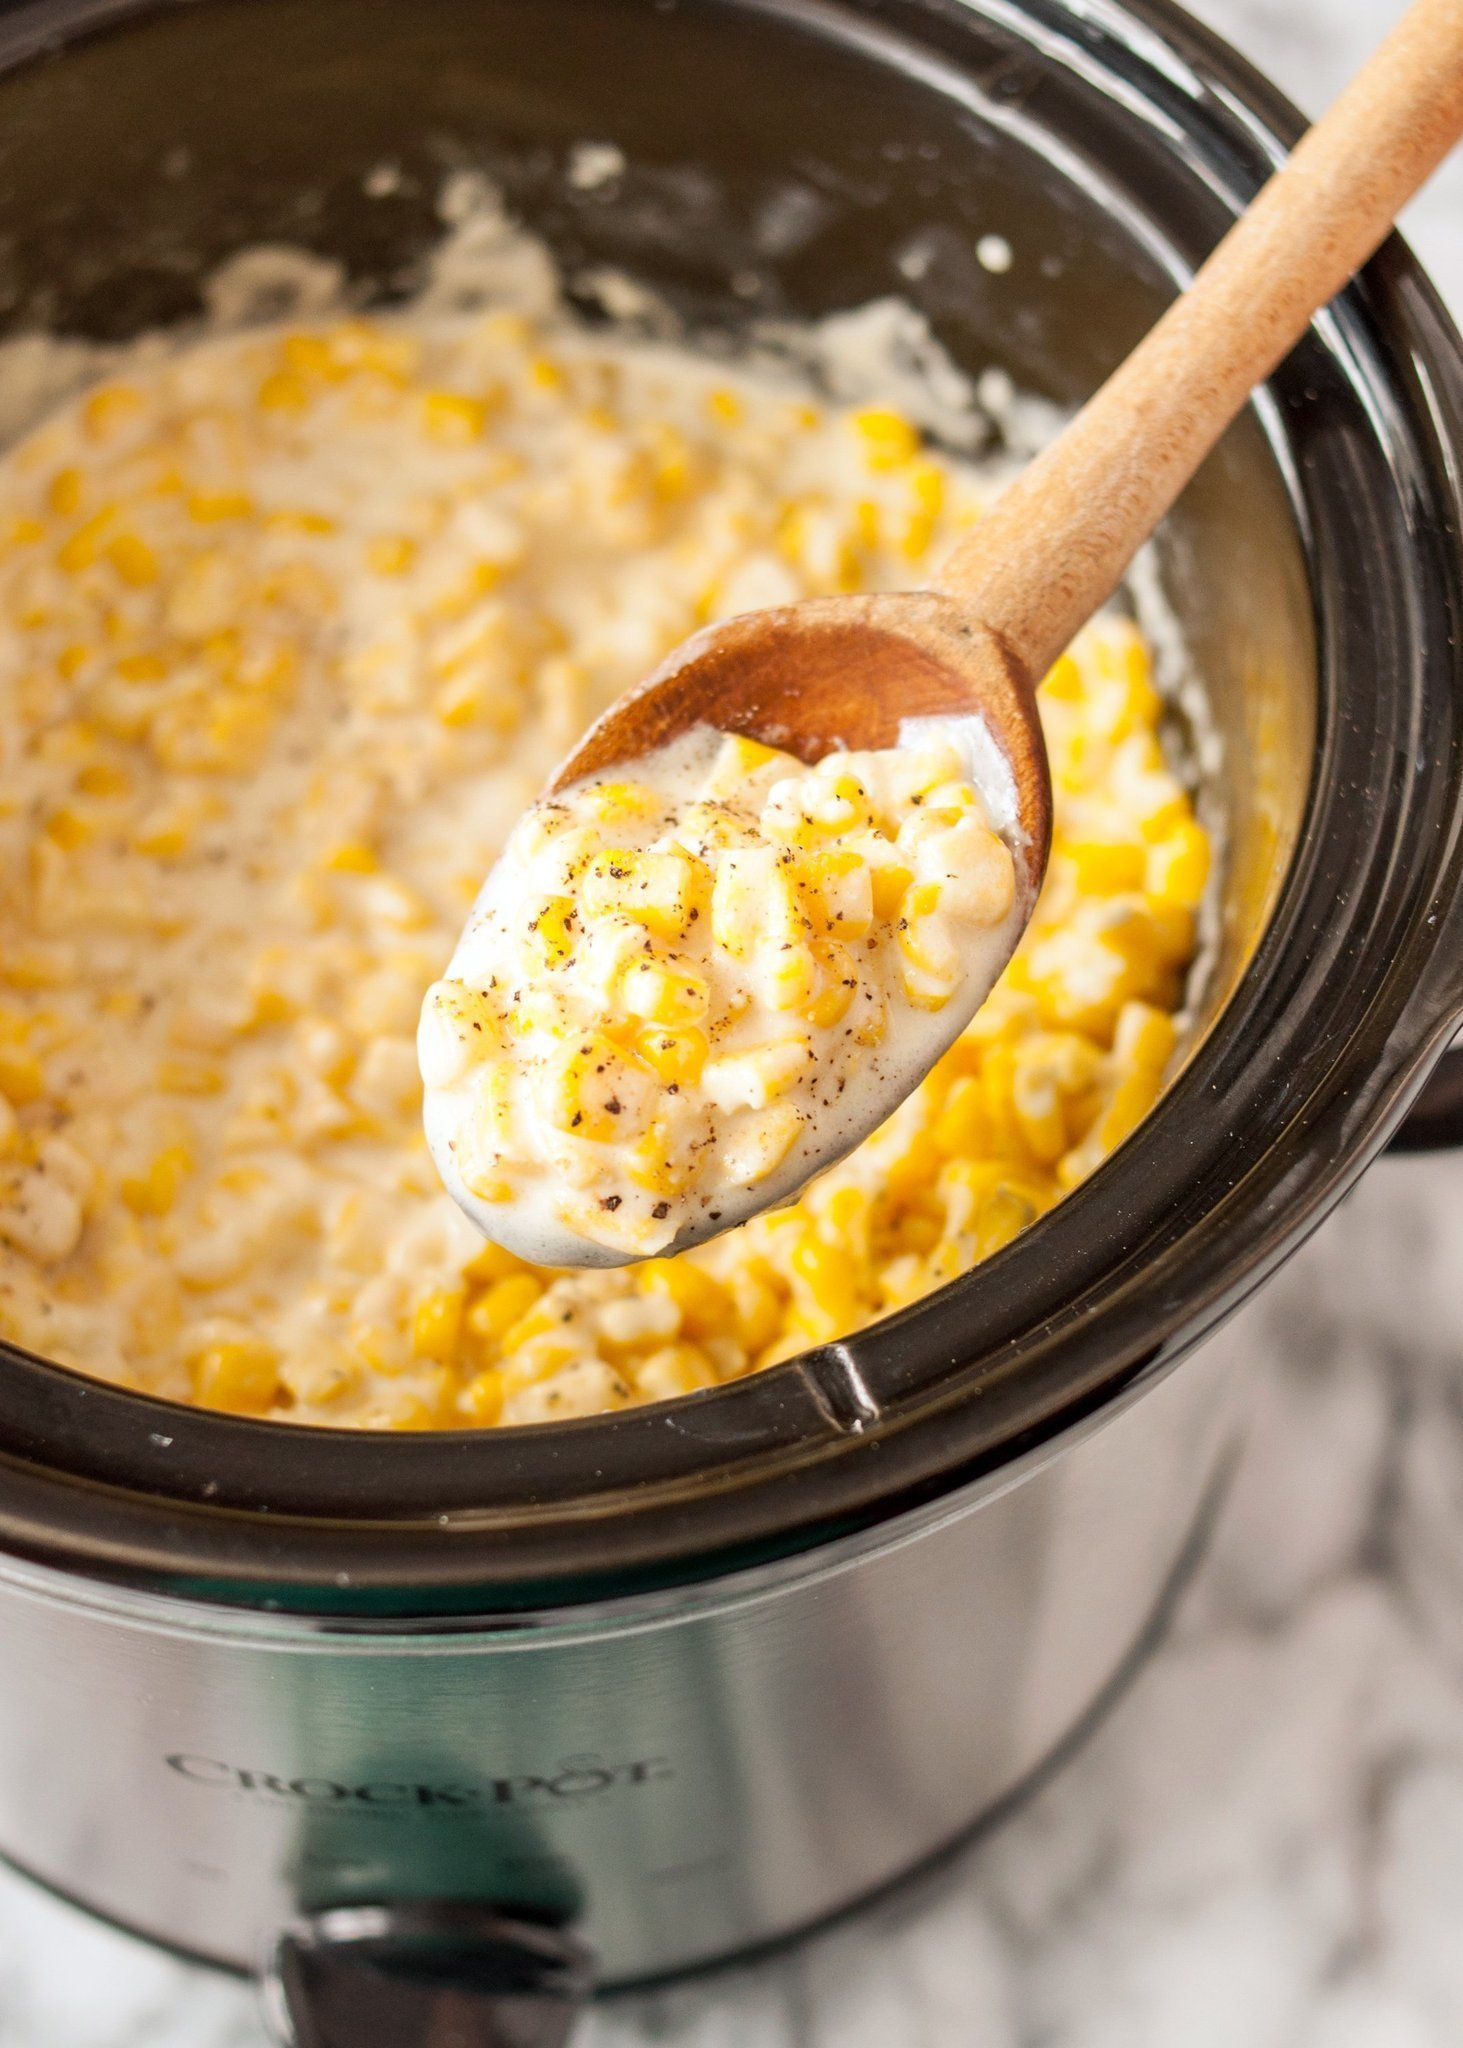 Probier das hier einmal aus: How To Make Slow Cooker Creamed Corn ...